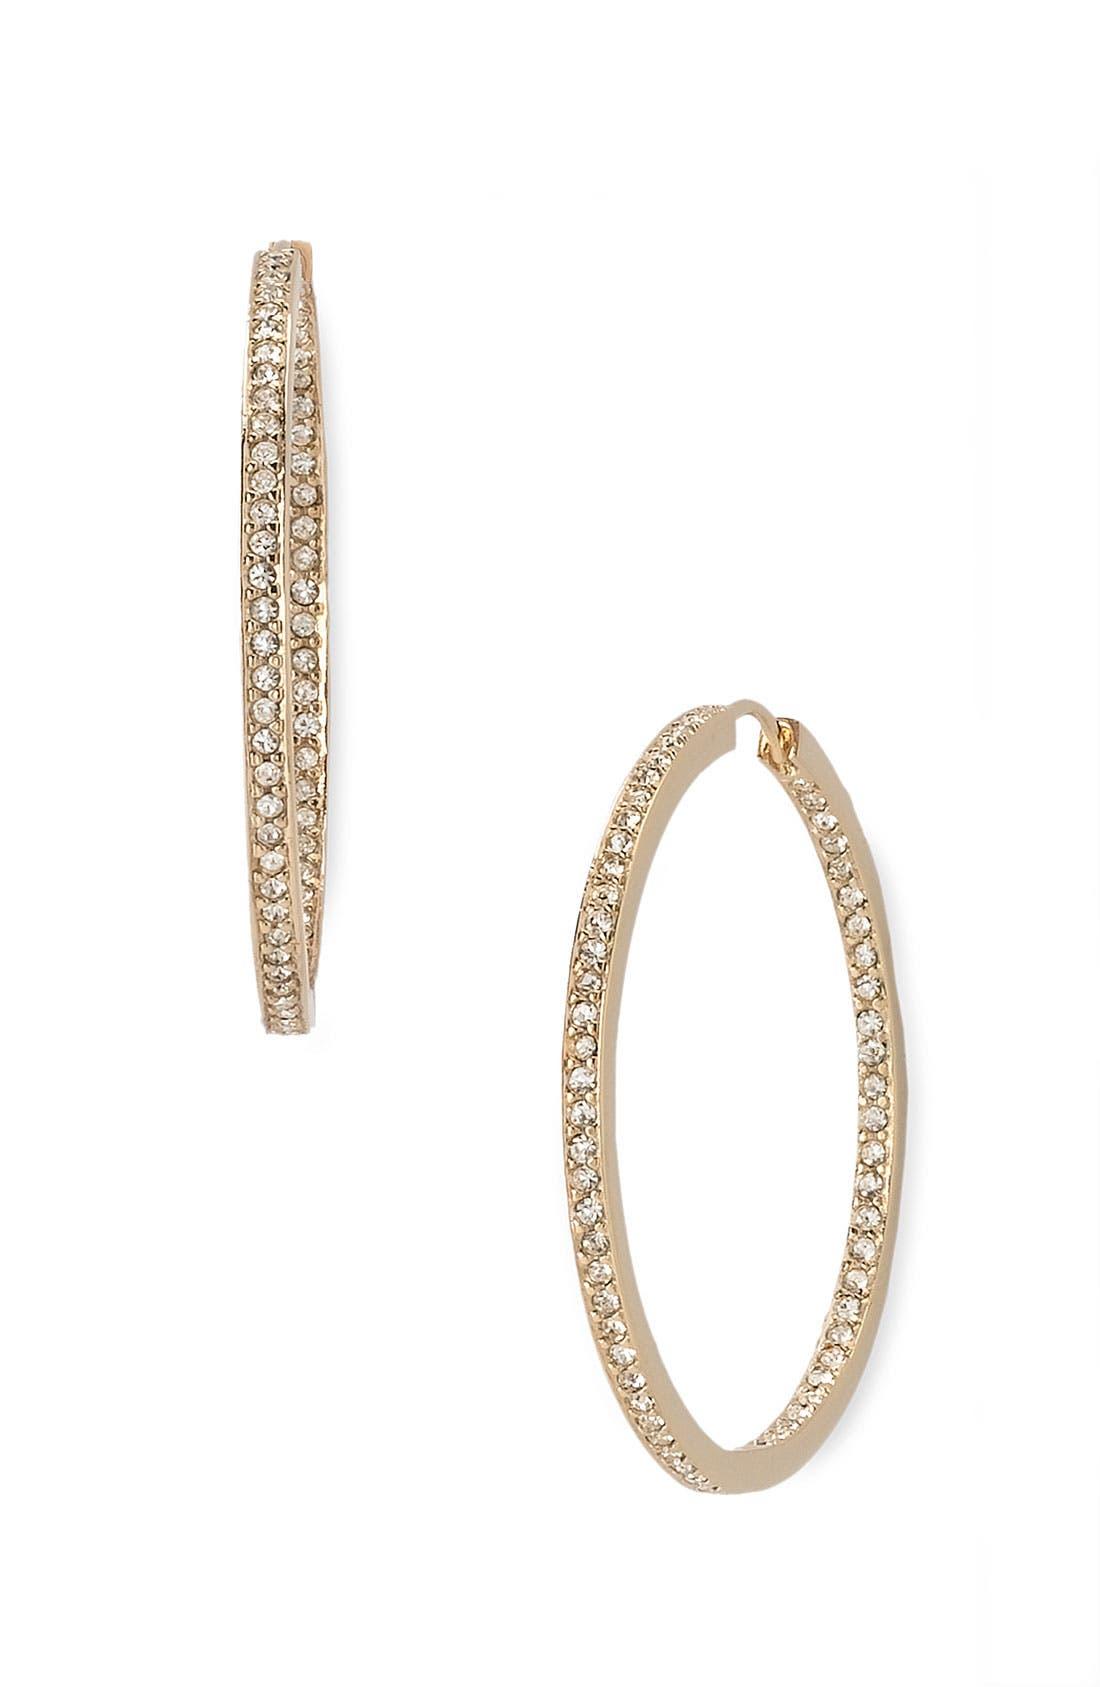 Main Image - Nadri Large Channel Hoop Earrings